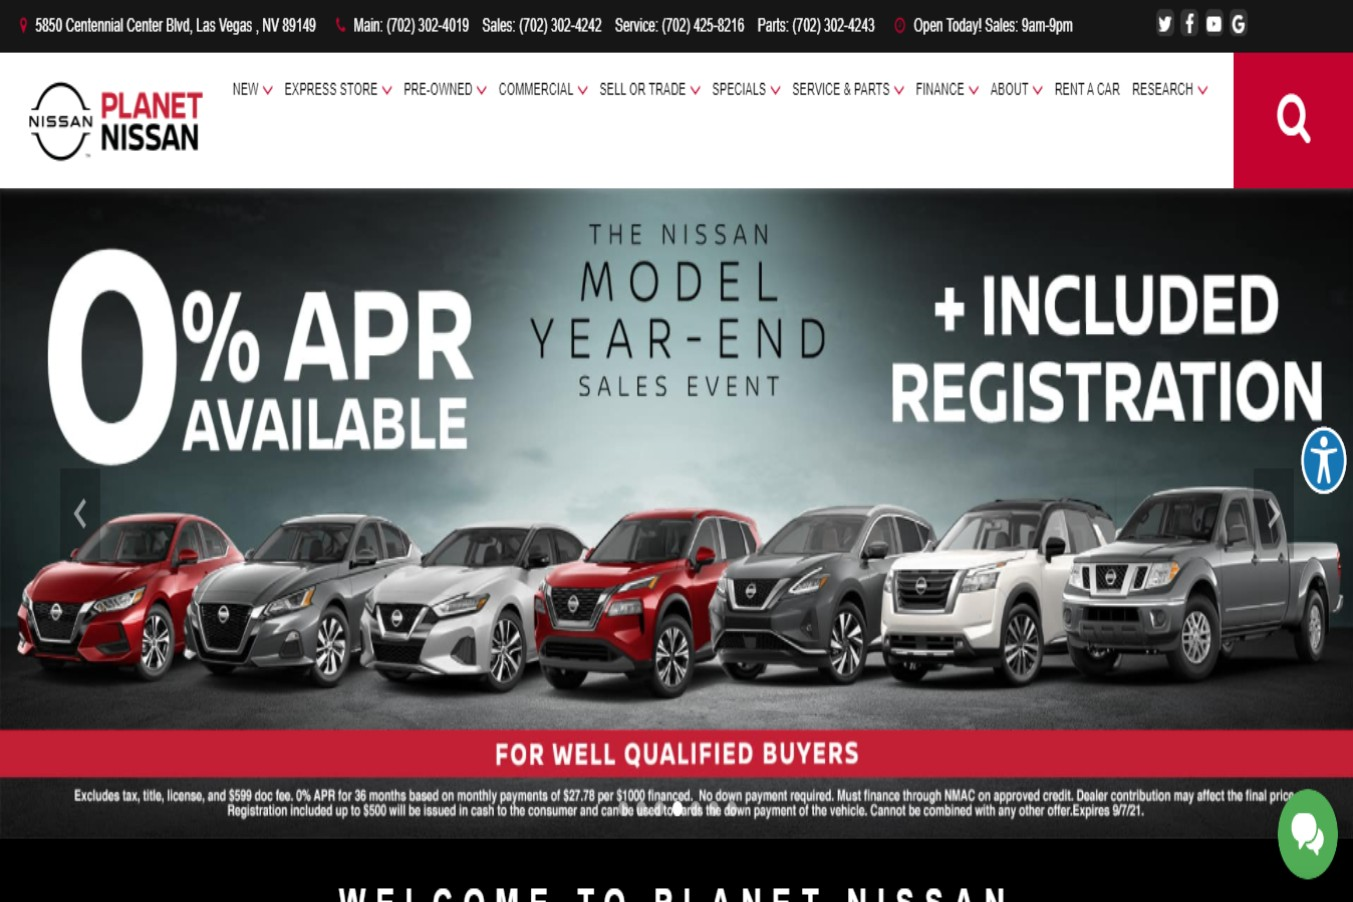 Premier Car dealership in Las Vegas, NV